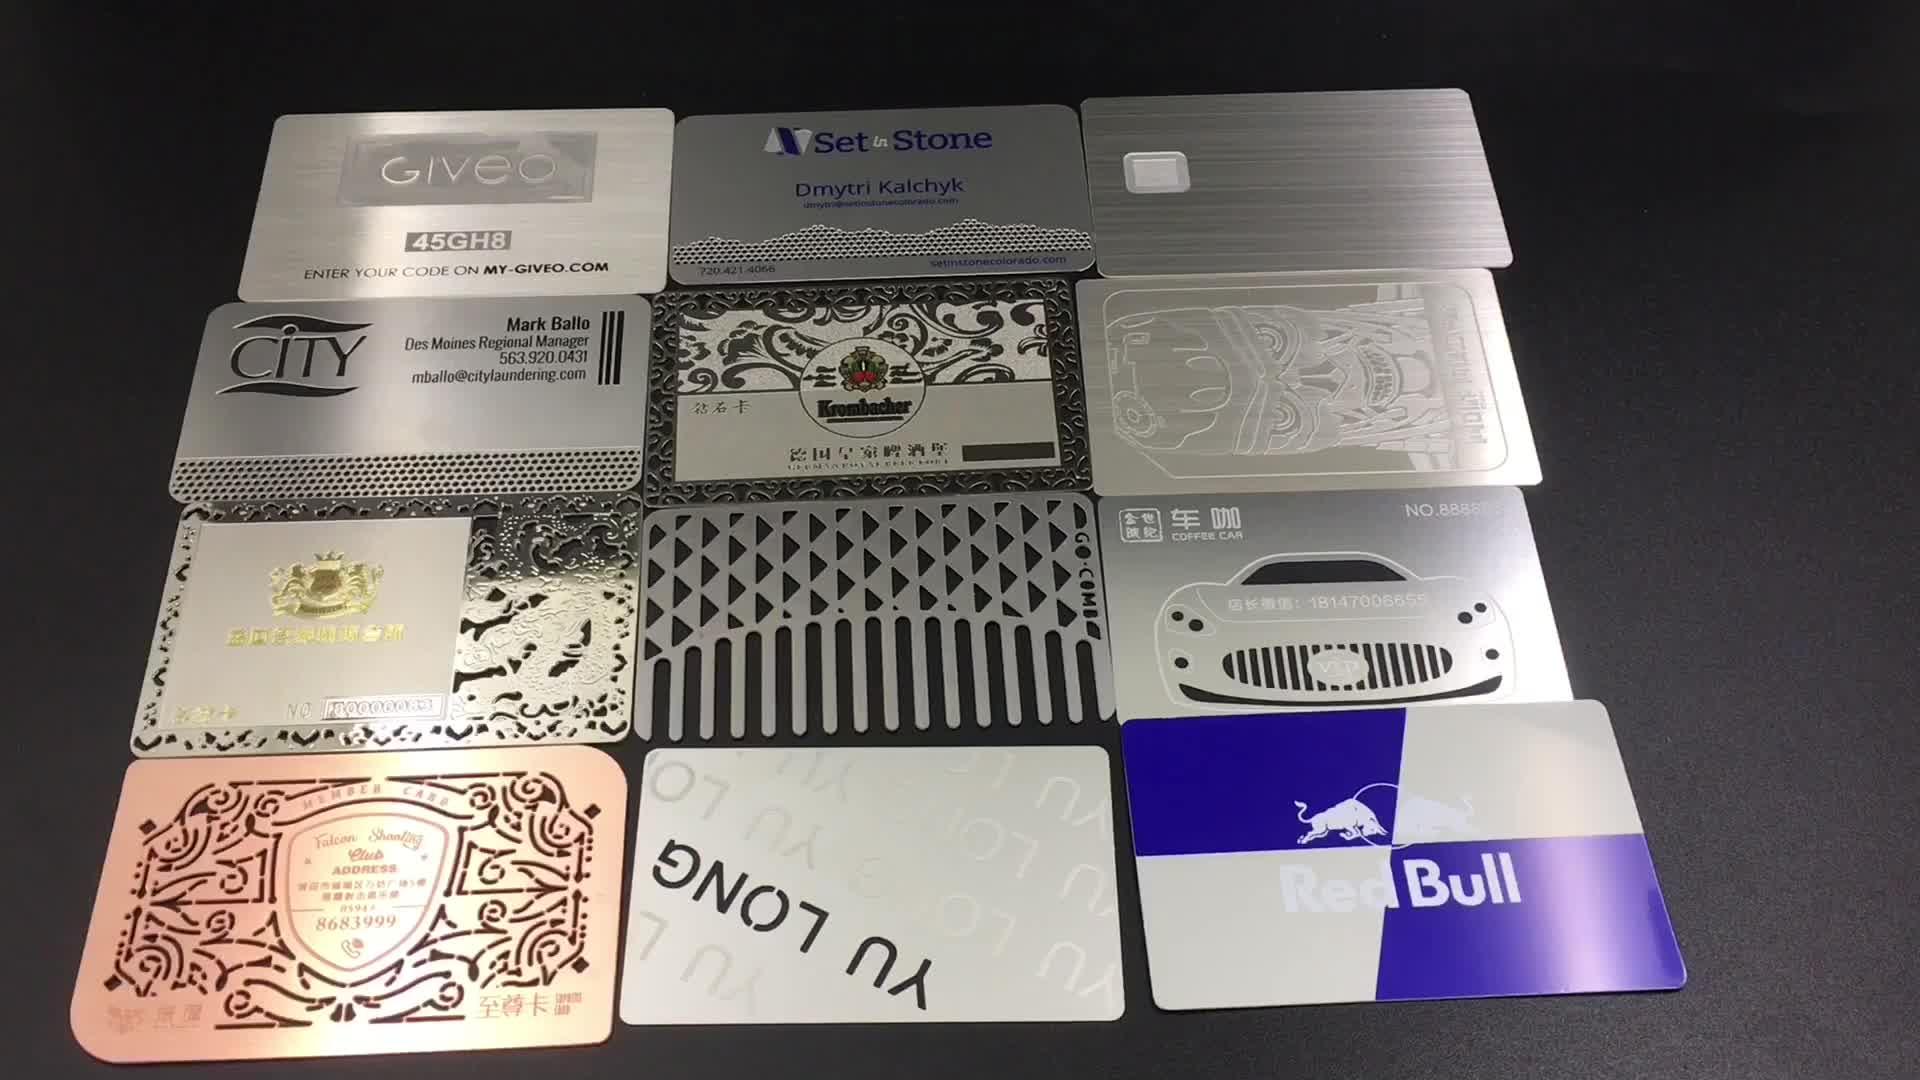 Hohe Qualität Günstigste Preis Metall Edelstahl Visitenkarten Buy Edelstahl Karten Edelstahl Visitenkarten Metall Edelstahl Visitenkarten Product On